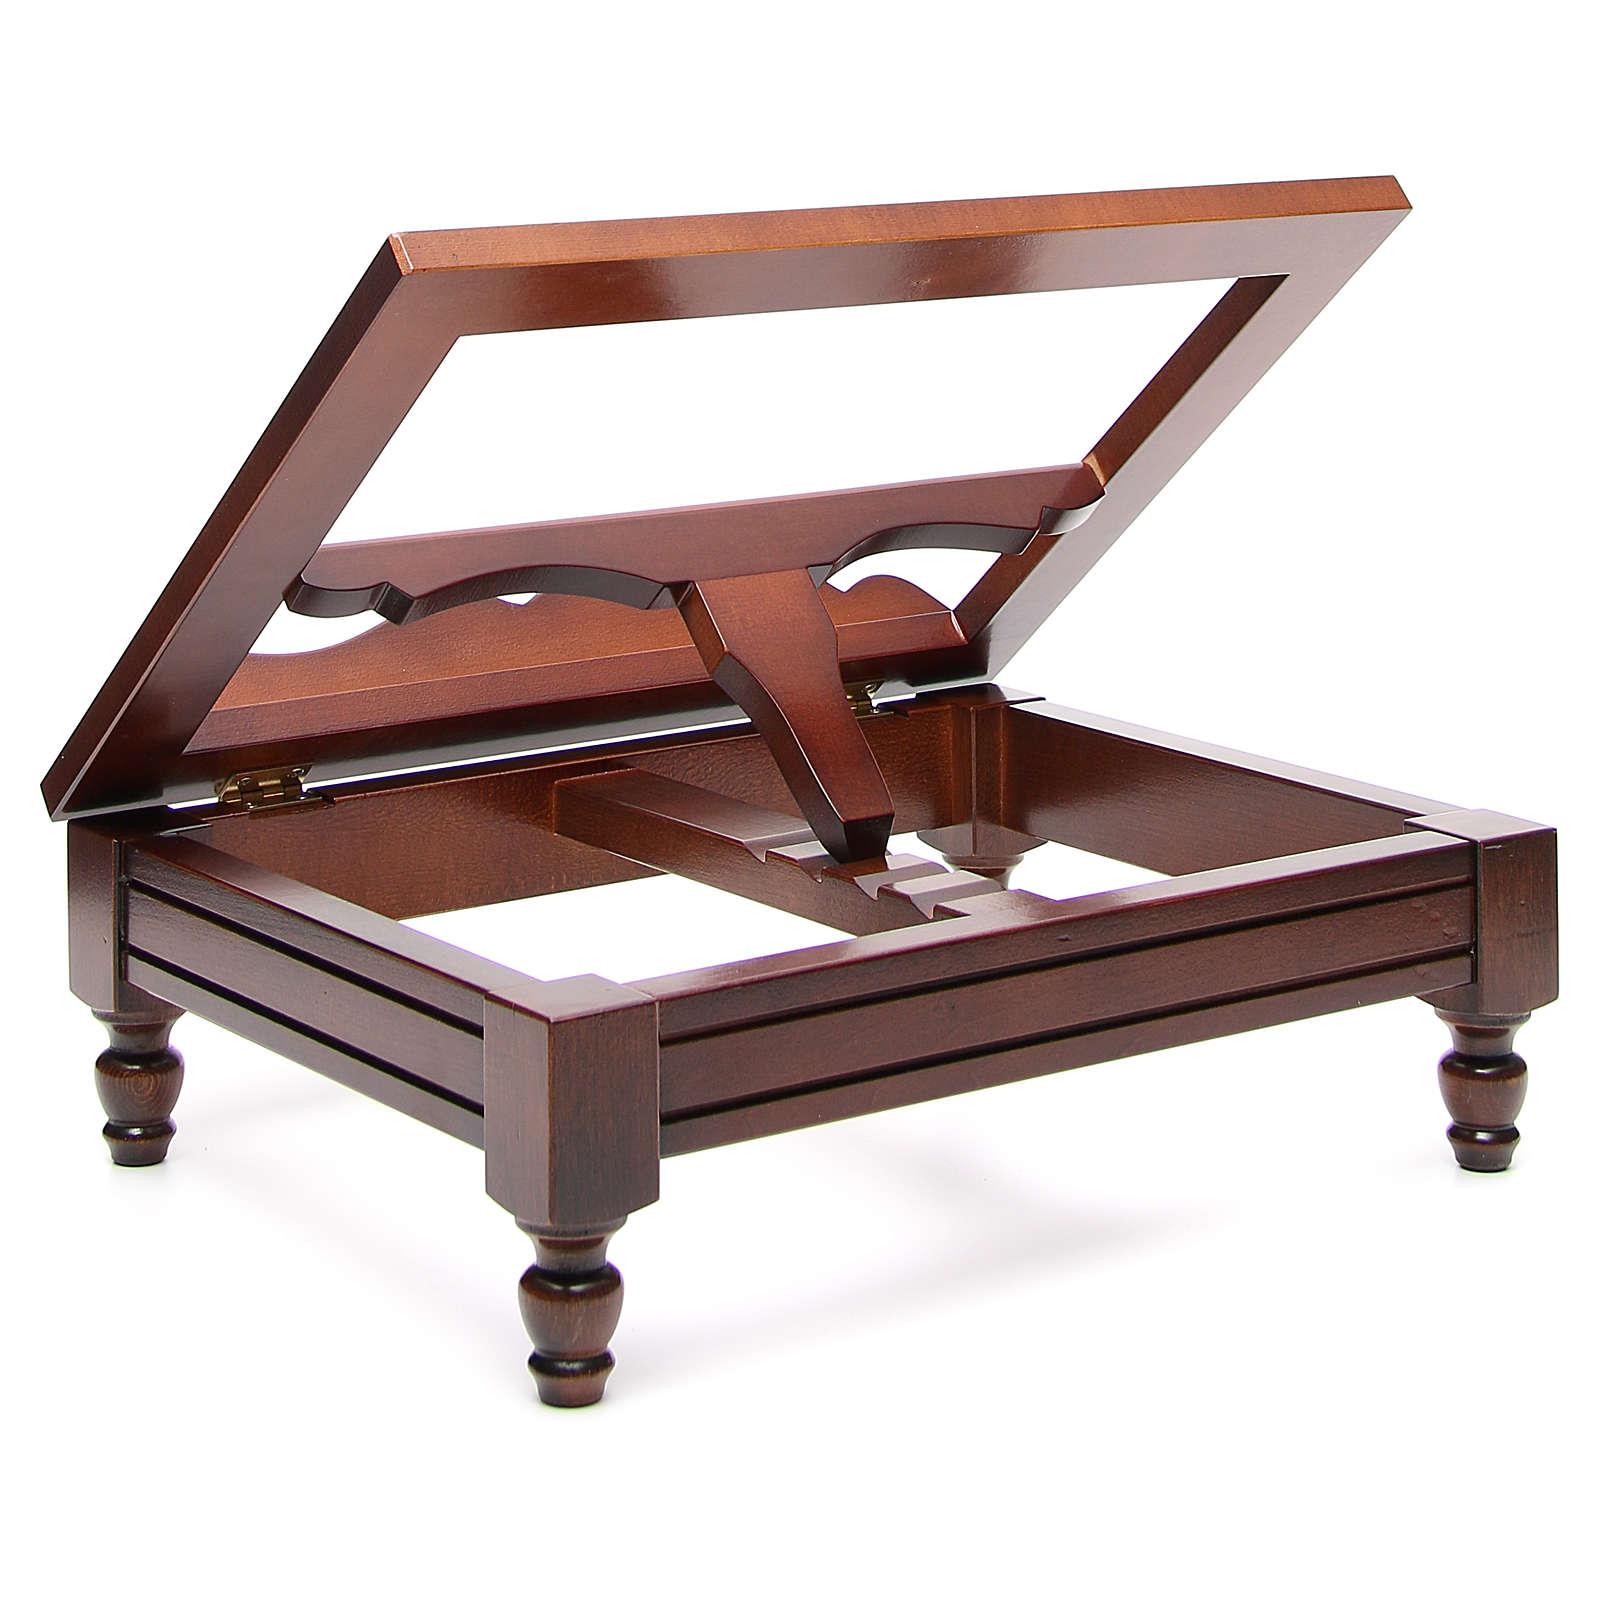 Classic missal stand in walnut wood 4